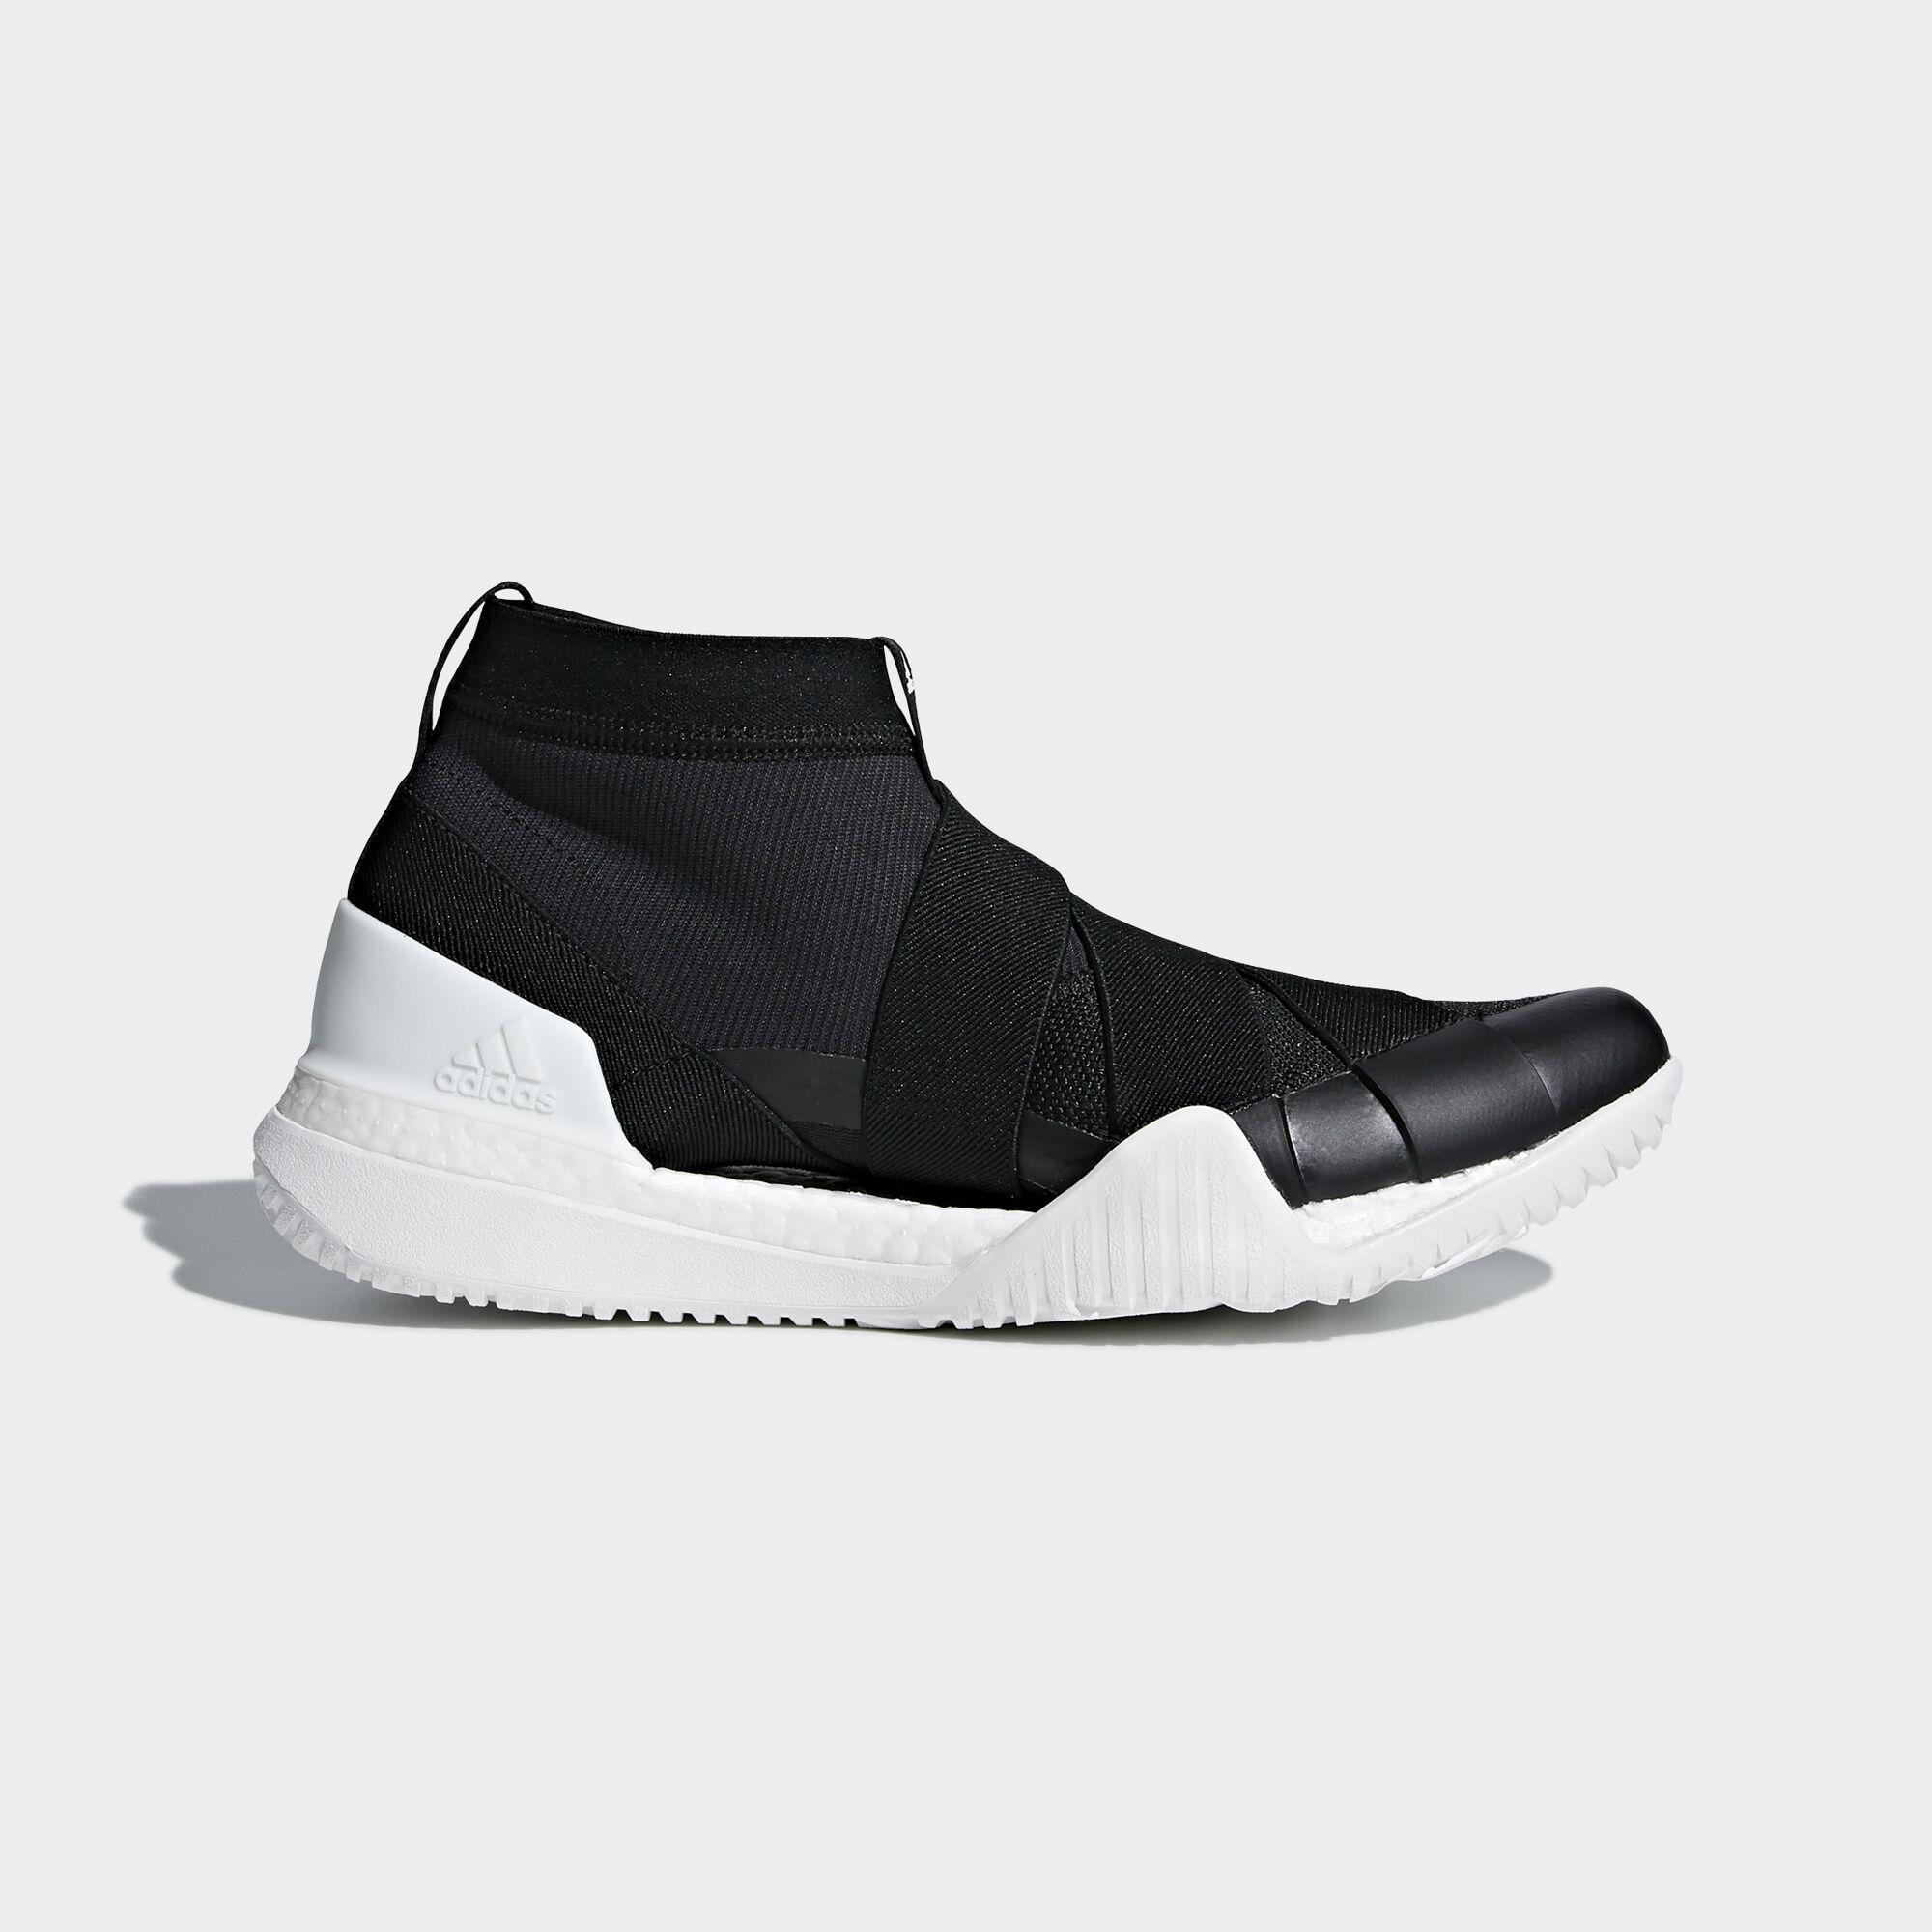 timeless design 8dfa9 ed487 adidas Wmns PureBOOST X TR 3.0 LL women training shoes NEW core black CG3524